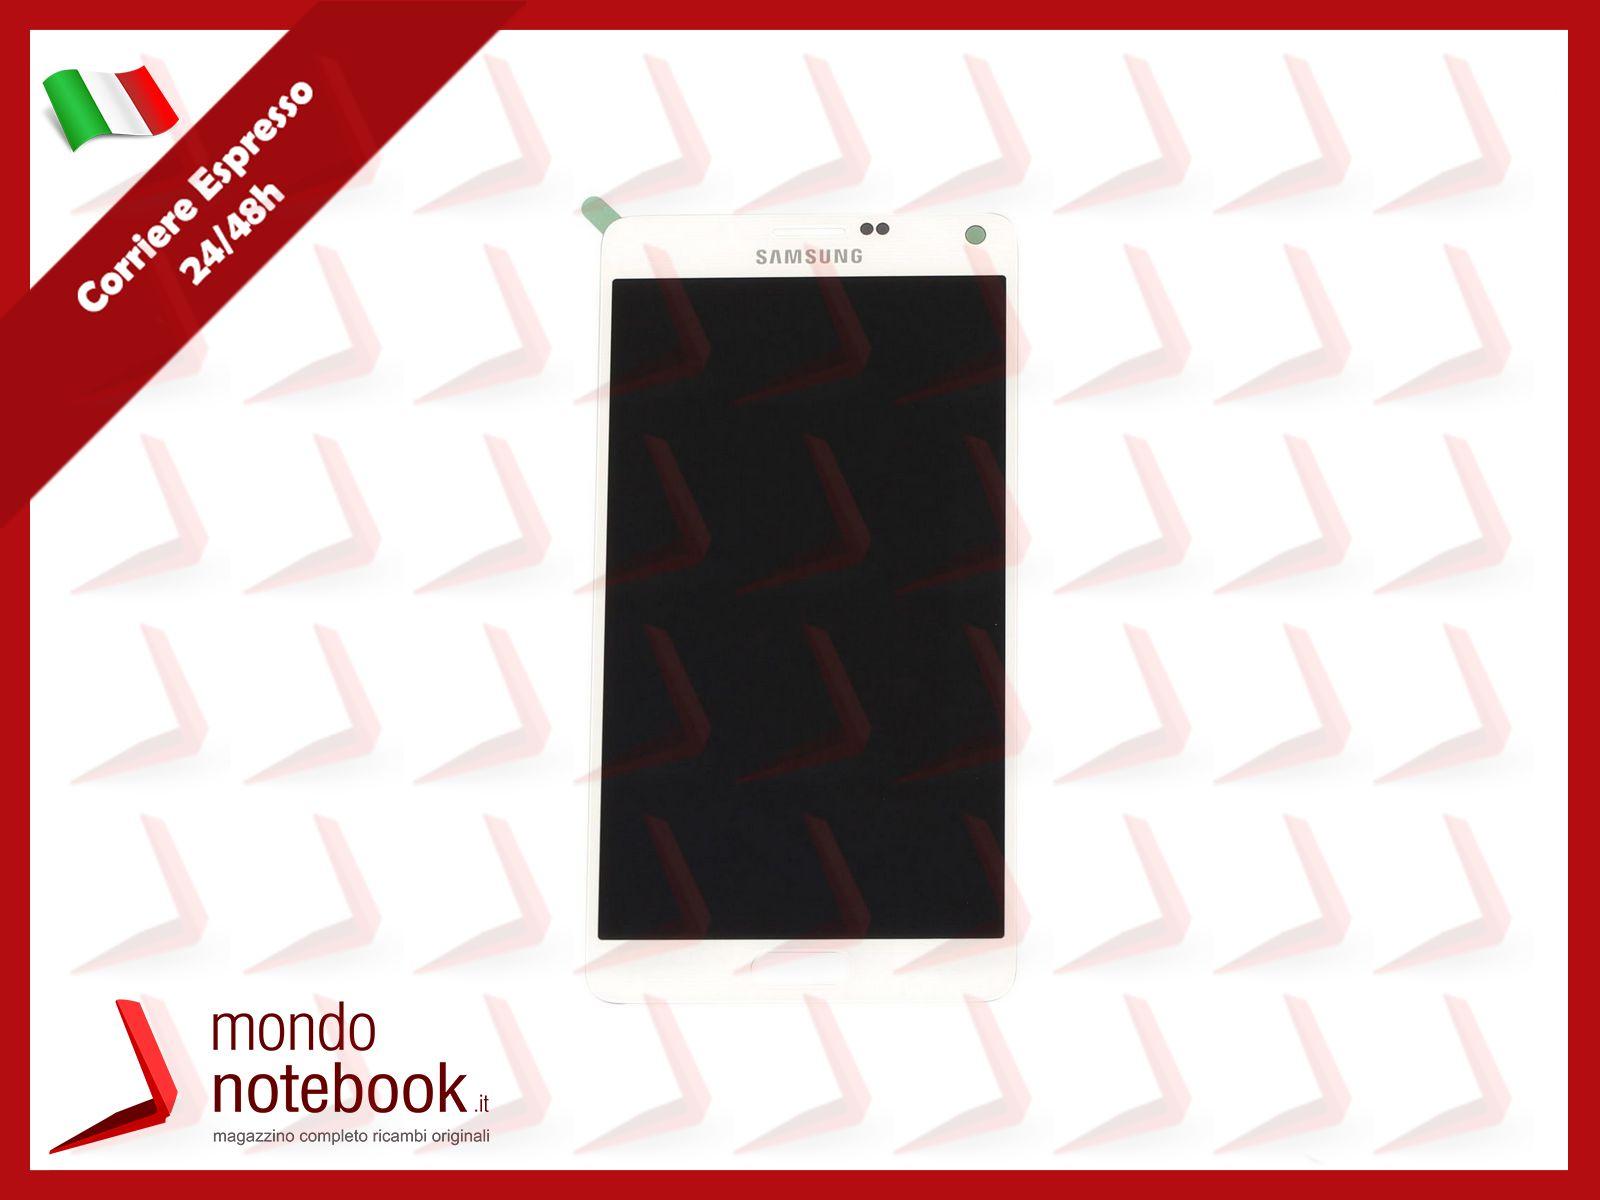 https://www.mondonotebook.it/11057/cerniere-hinges-hp-dv5000-coppia.jpg